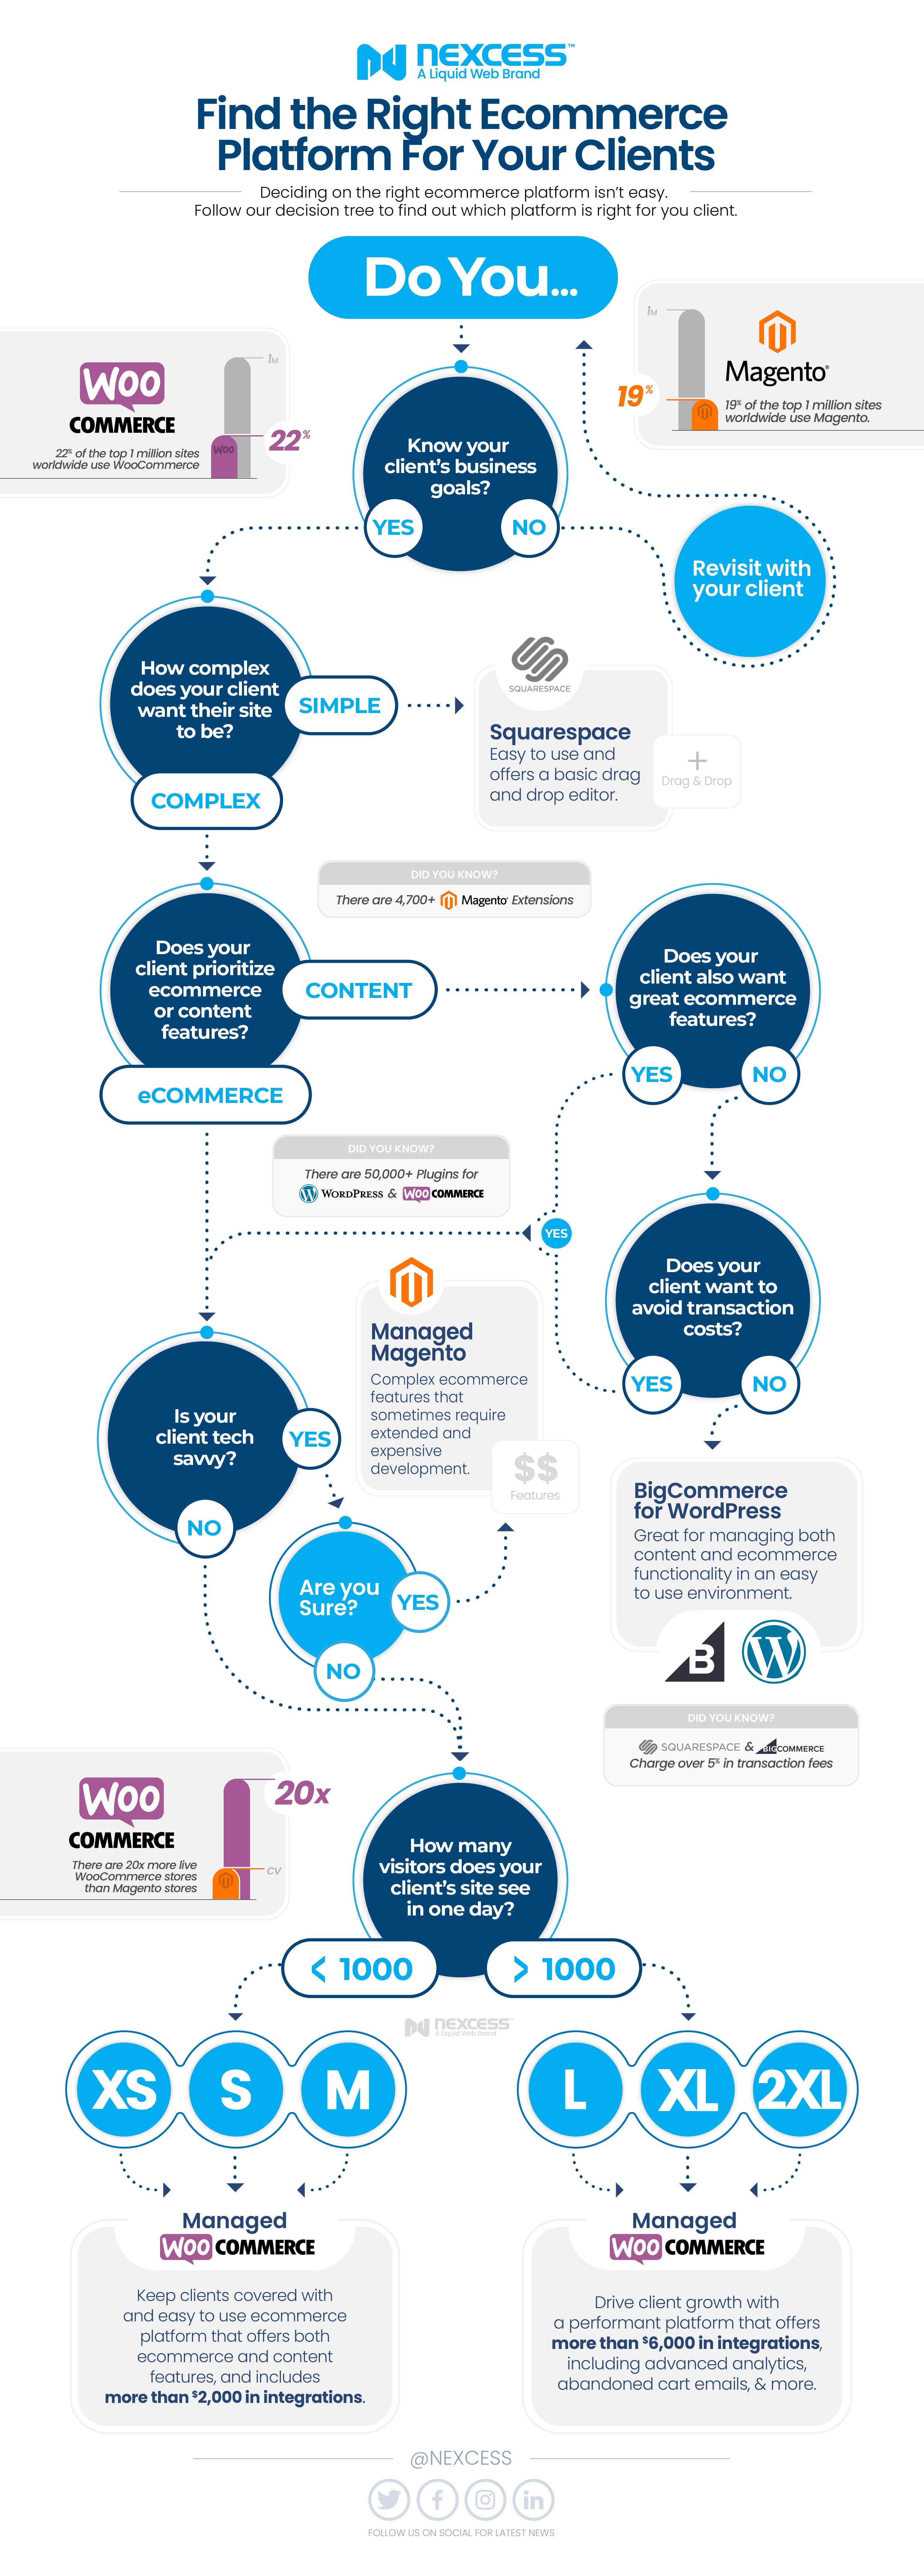 The ecommerce platform decision tree